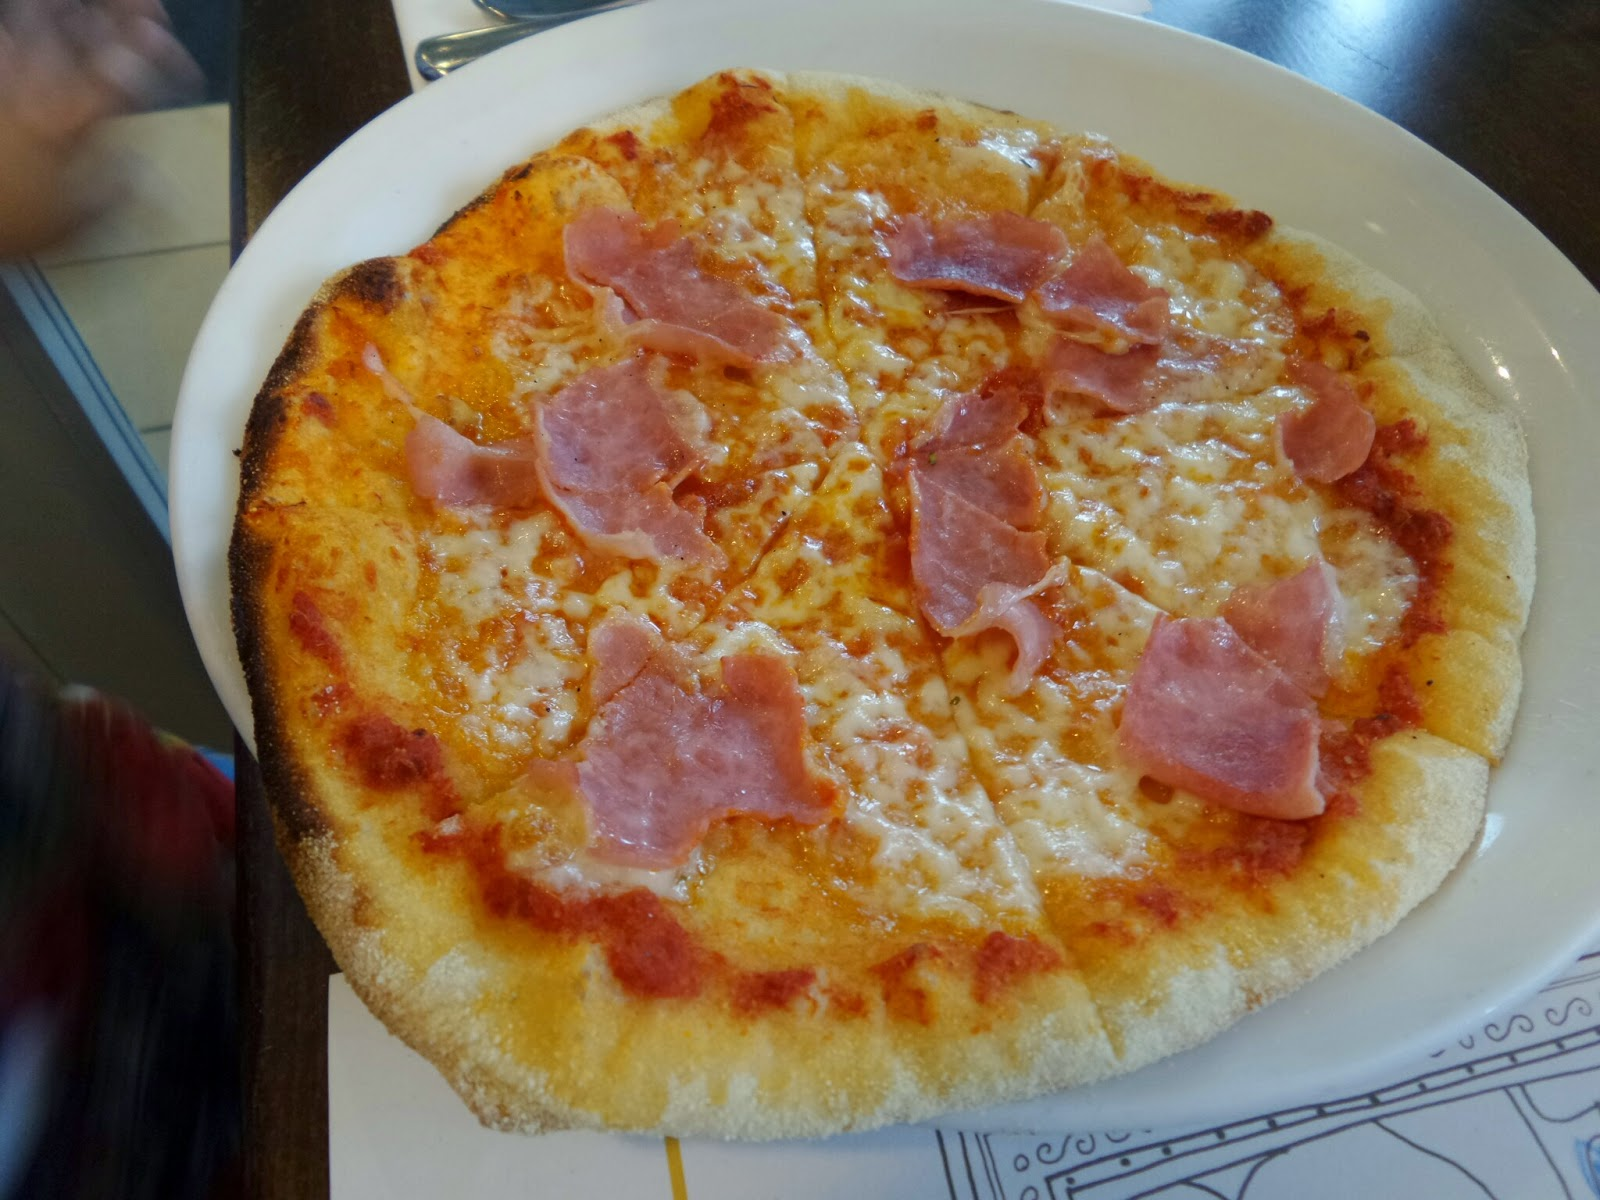 Zizzi's Bambini Pizza with Ham